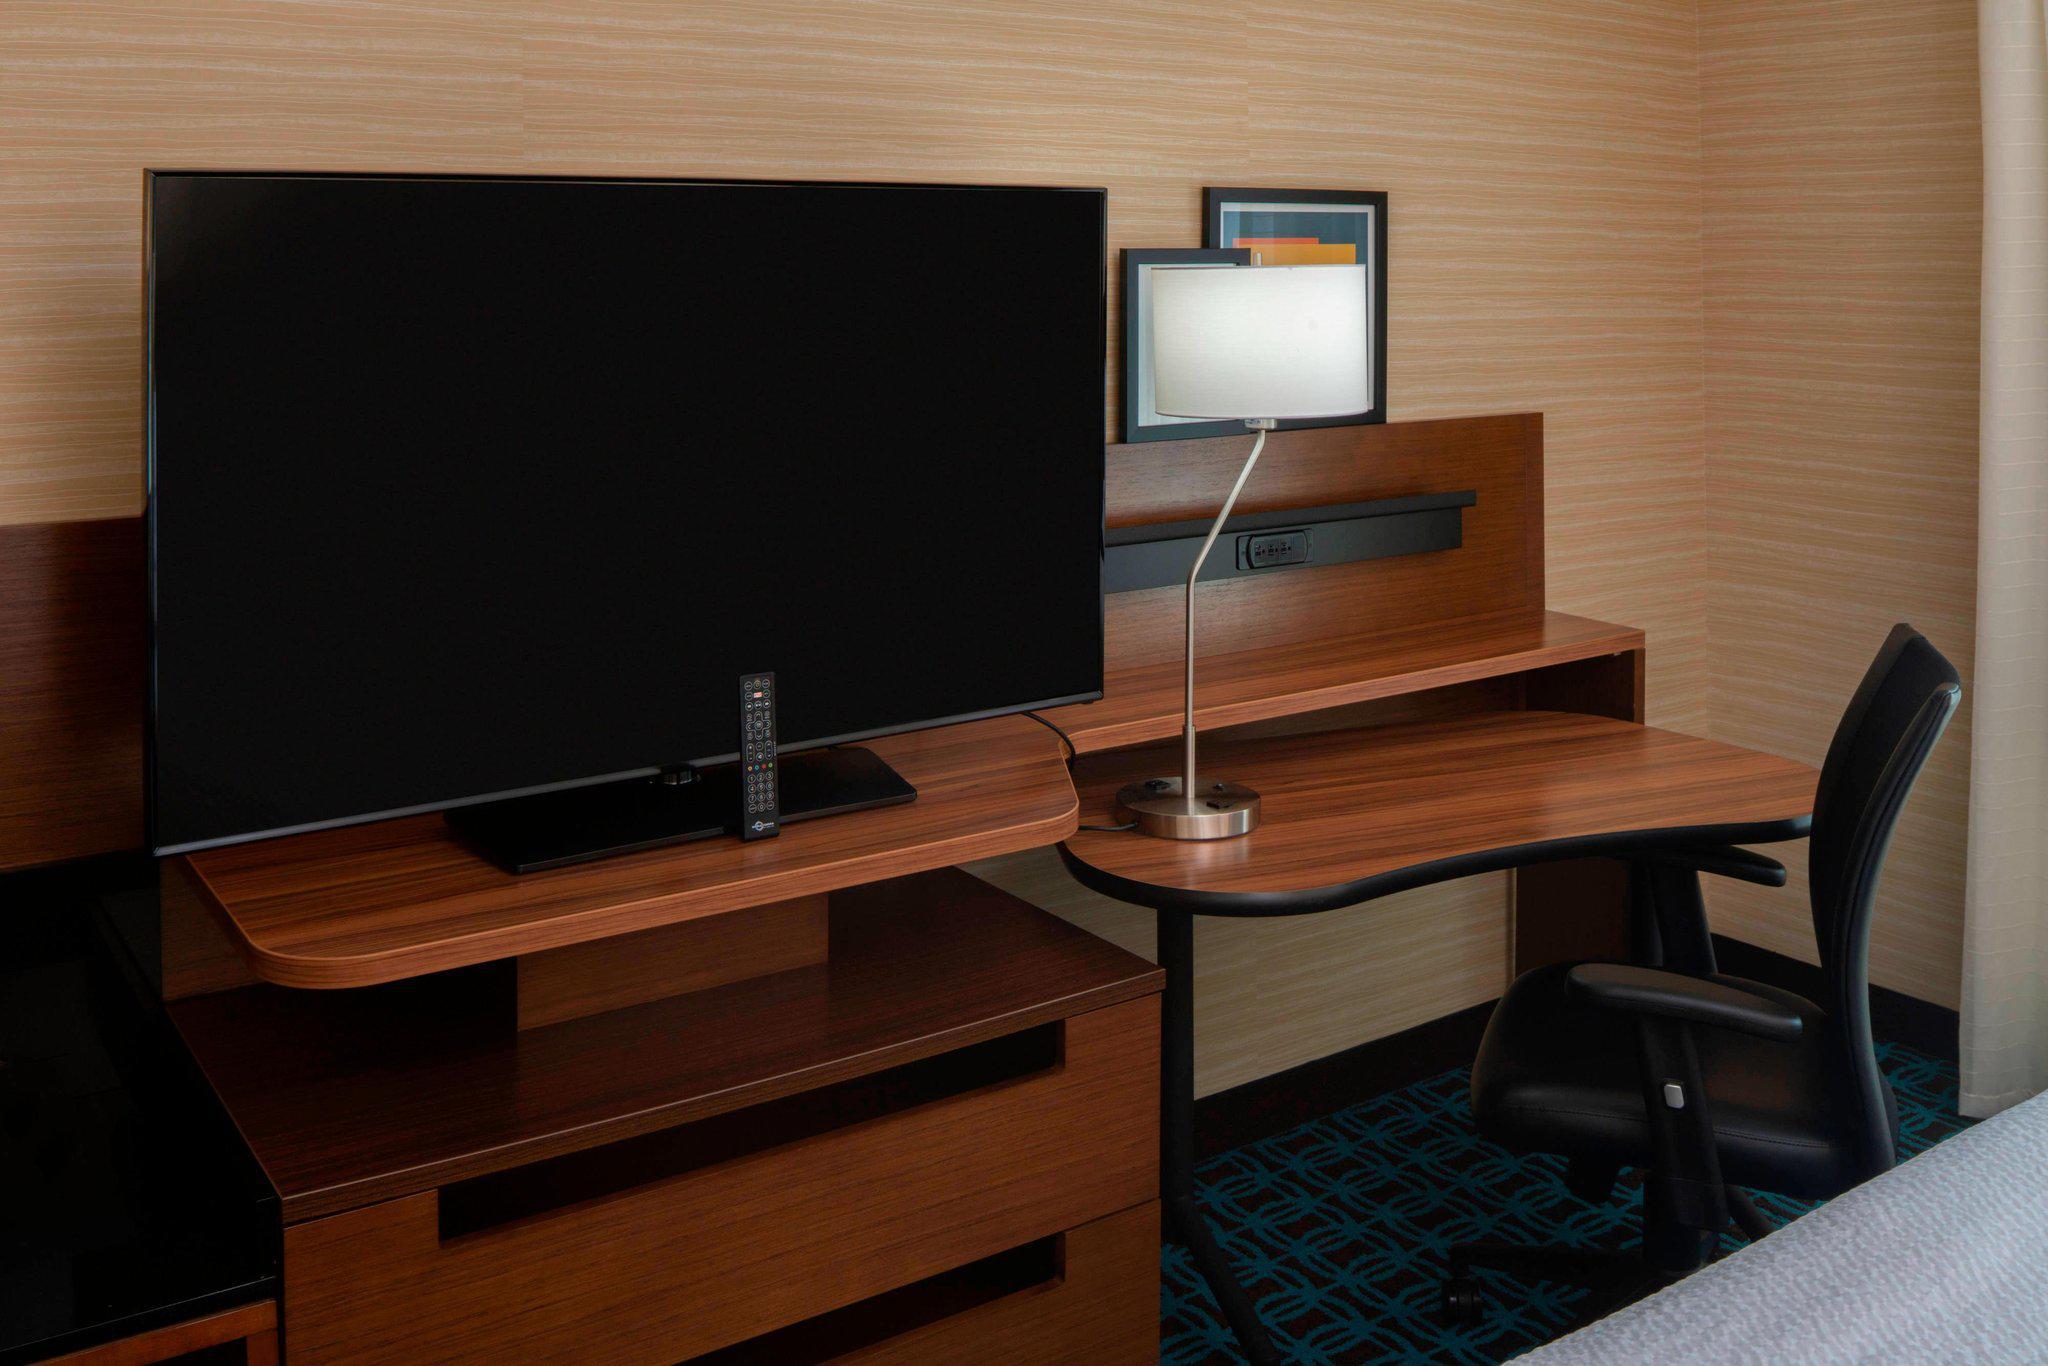 Fairfield Inn & Suites by Marriott Batesville